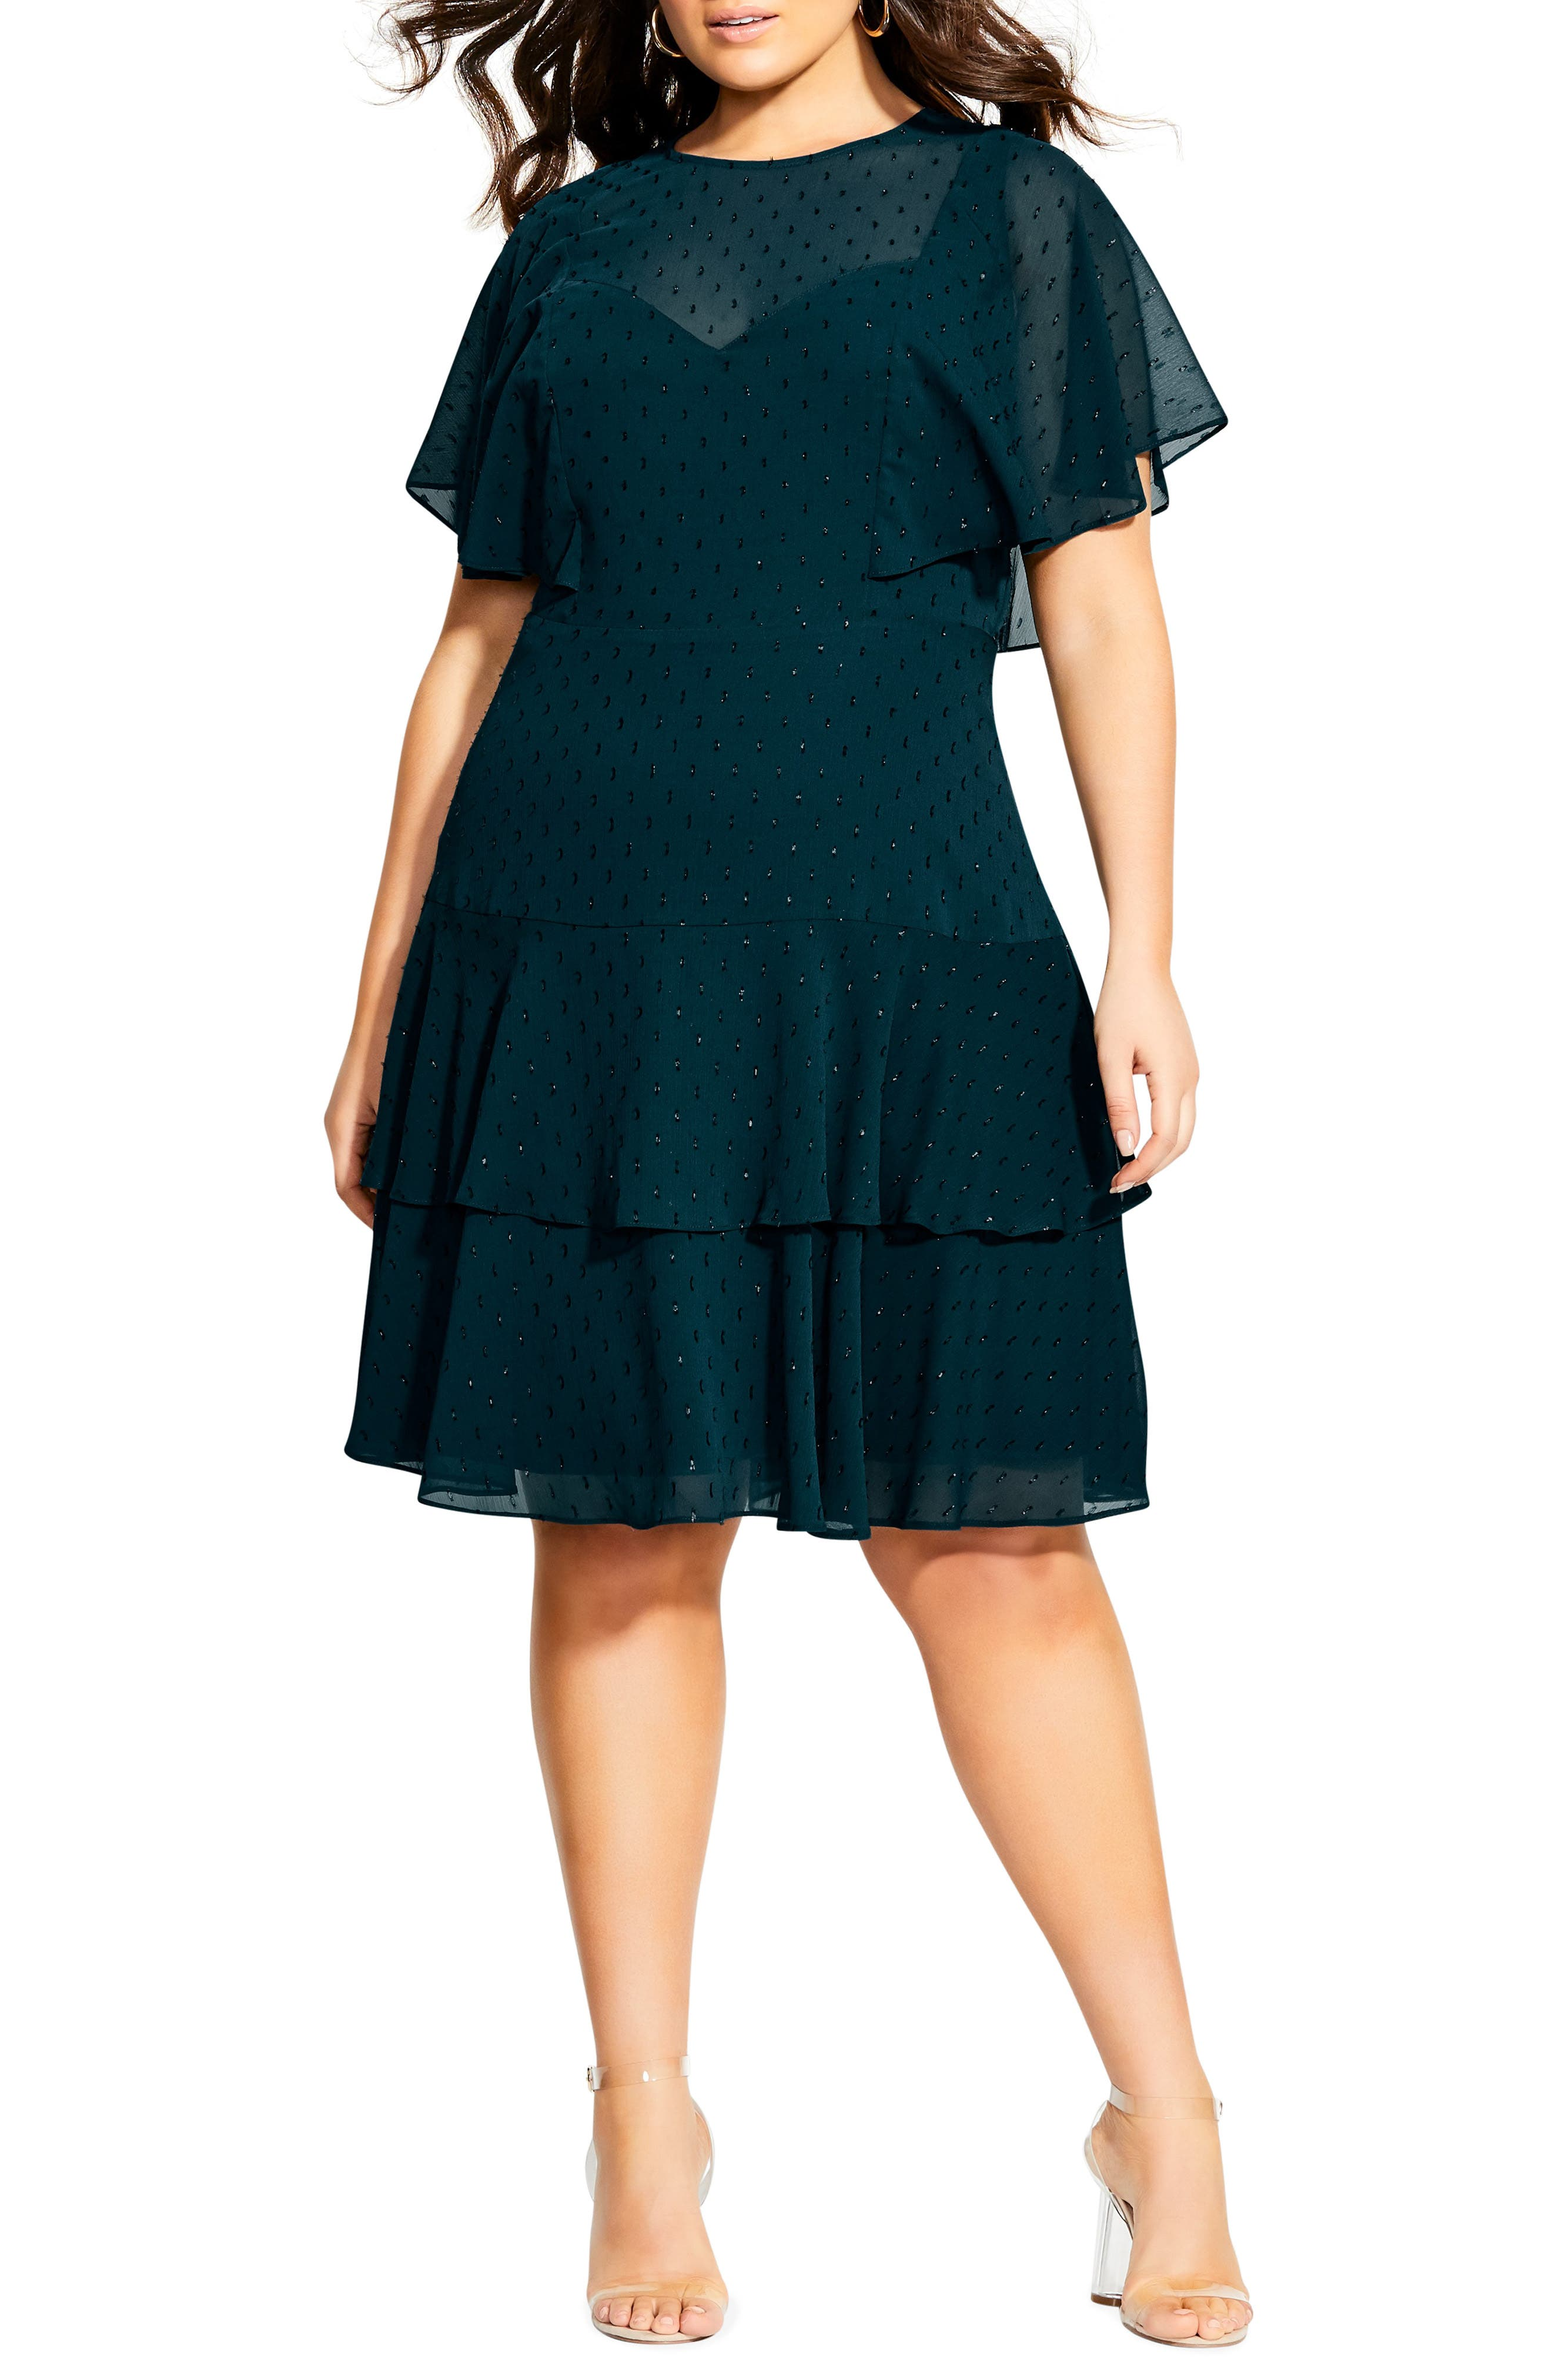 1920s Plus Size Flapper Dresses, Gatsby Dresses, Flapper Costumes Plus Size Womens City Chic Metallic Textured Dot Ruffle Dress $79.73 AT vintagedancer.com